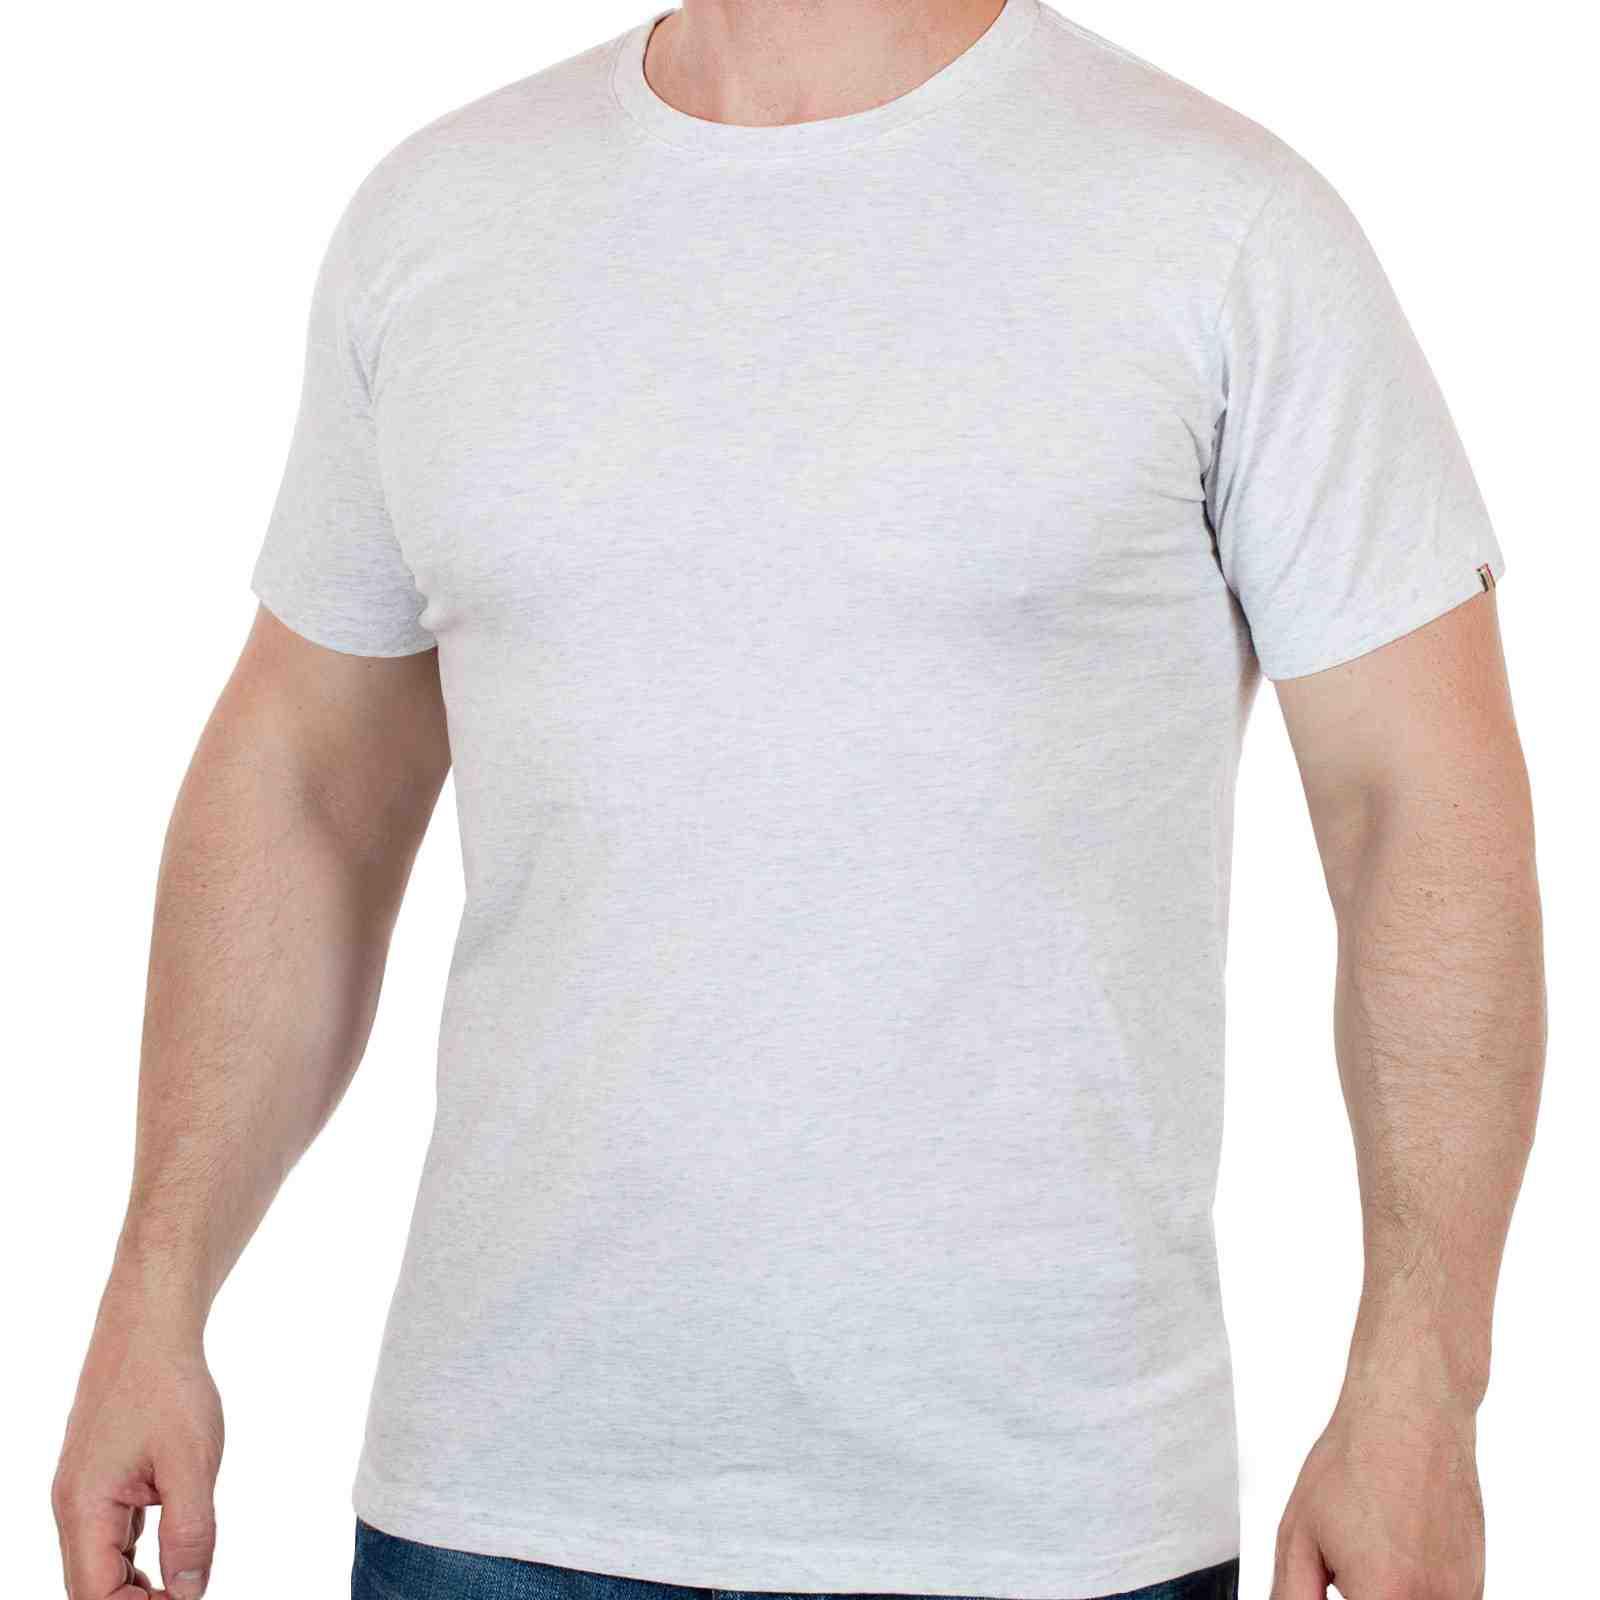 Мужская футболка от Academy - американский тренд-главная